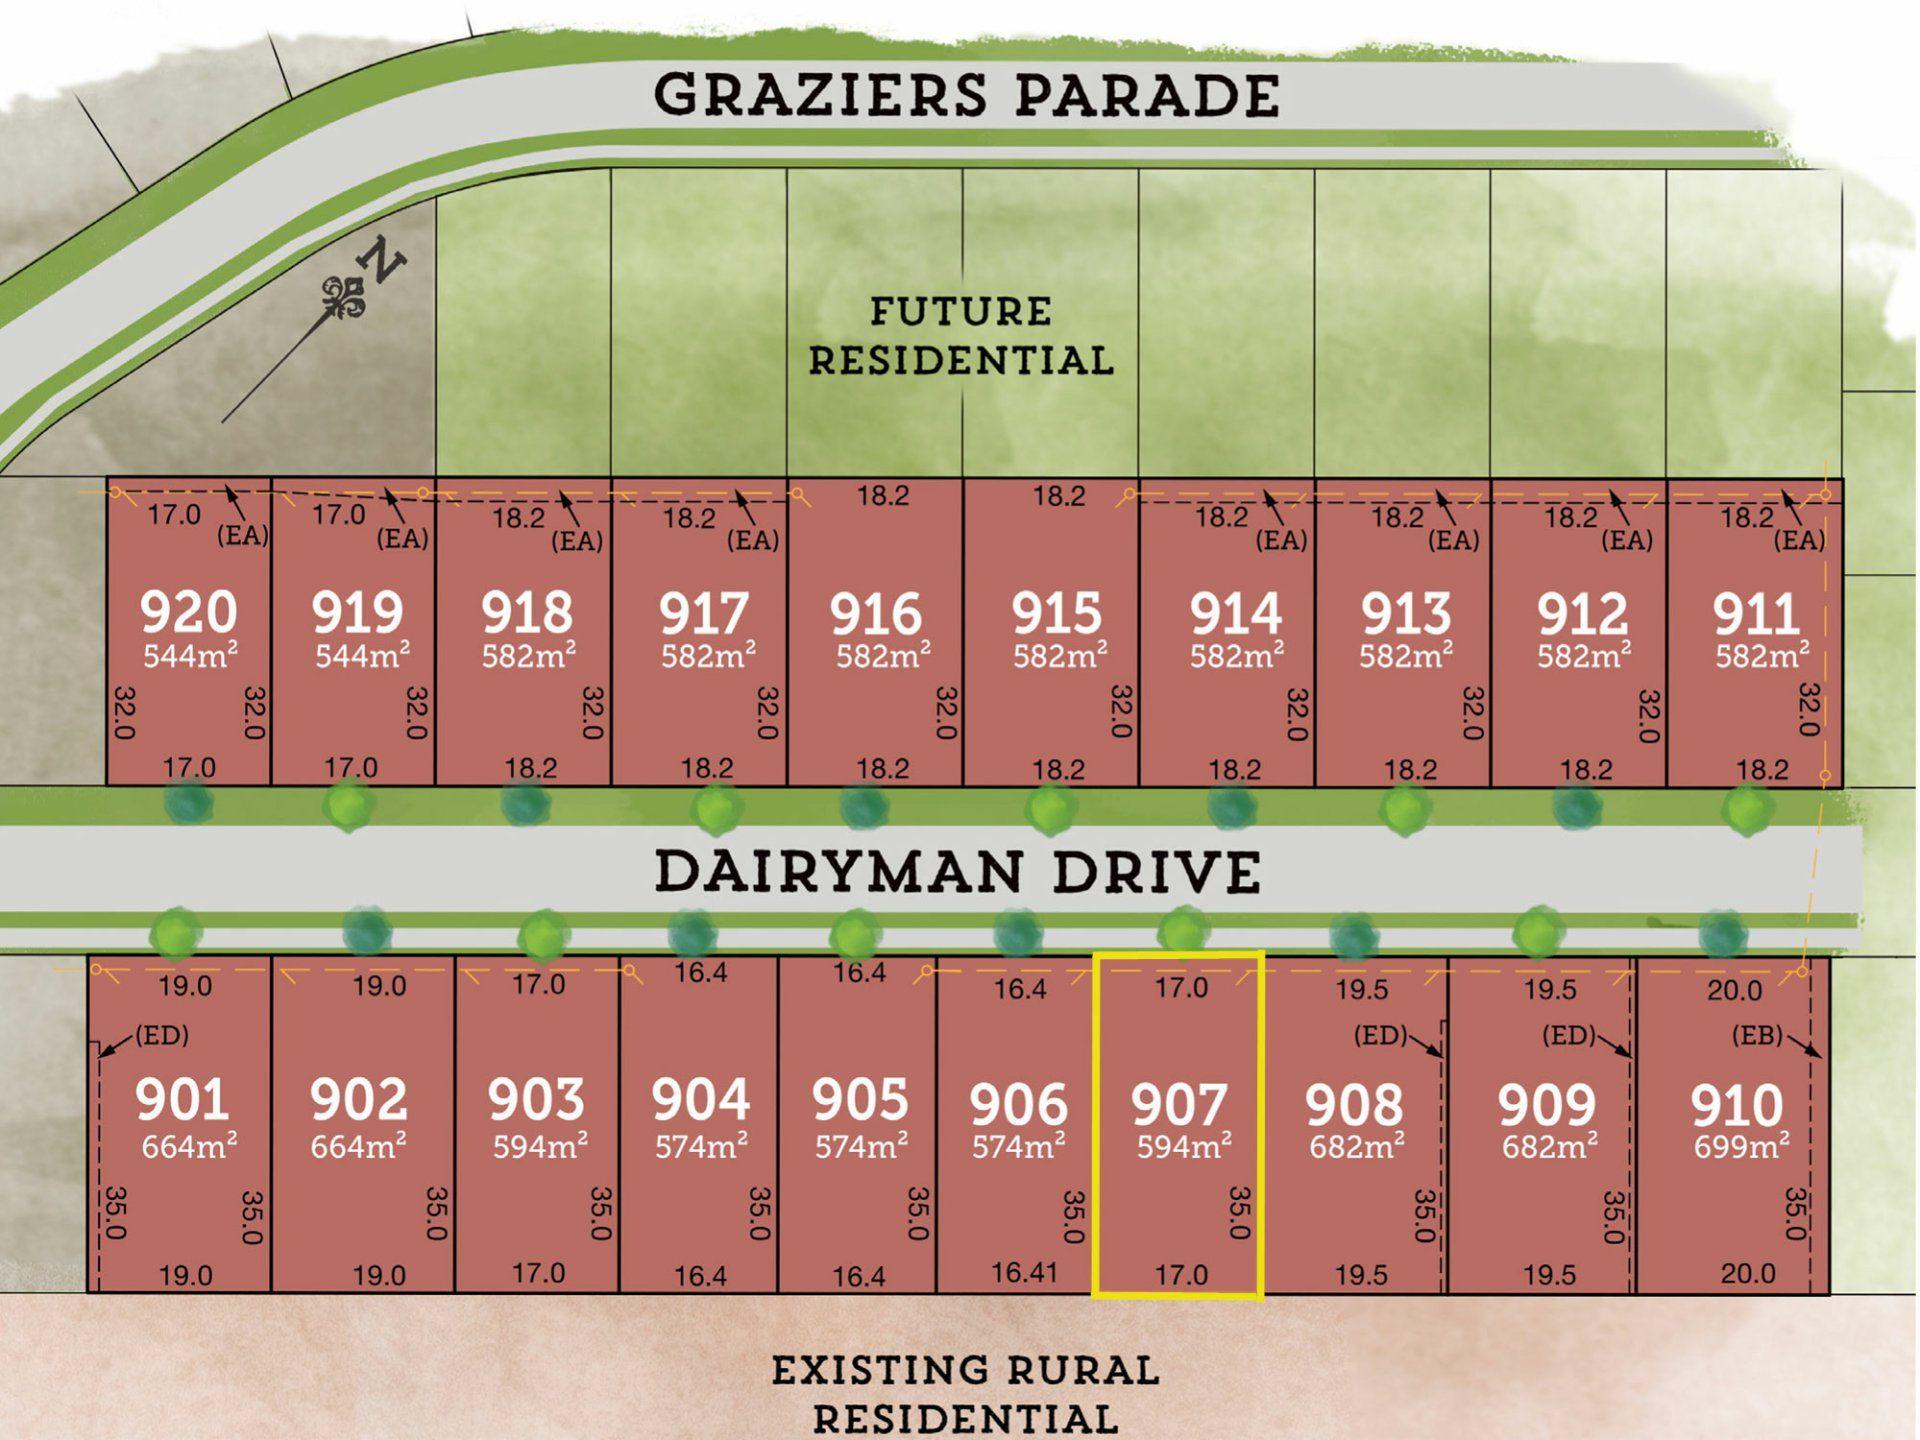 907 Dairyman Drive RAYMOND TERRACE 2324